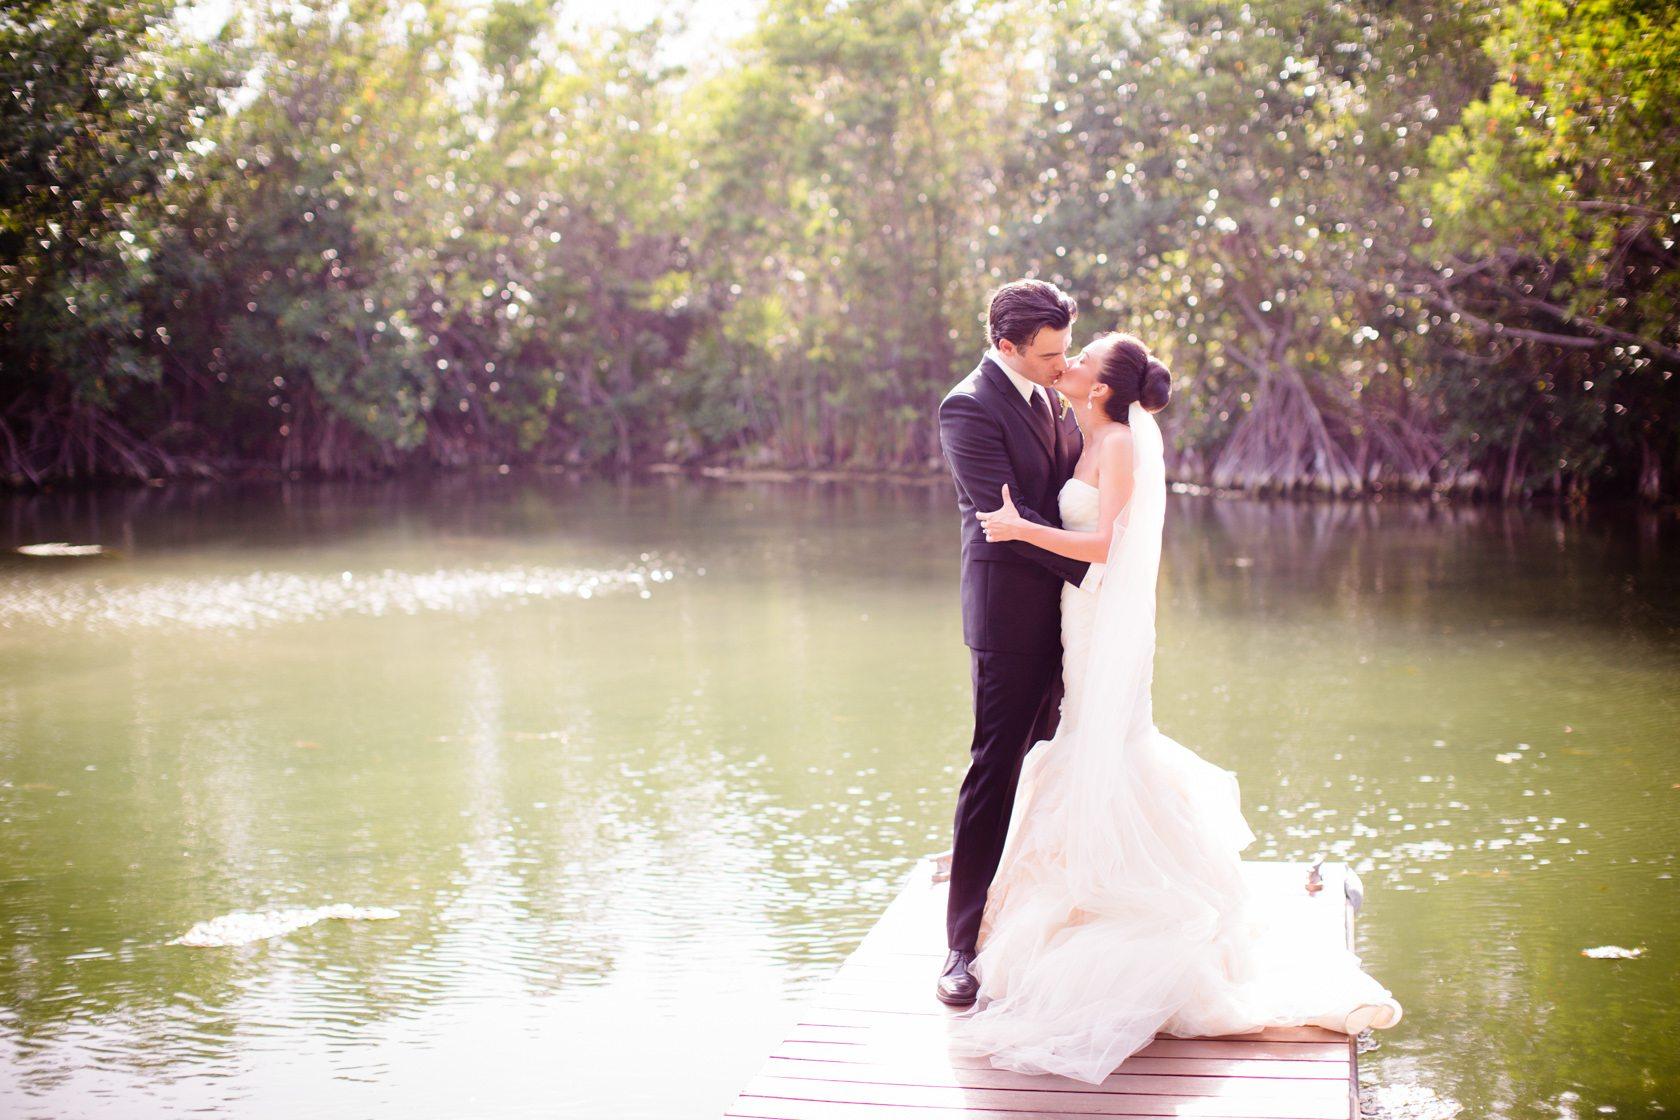 Fairmont_Mayakoba_Wedding_031.jpg